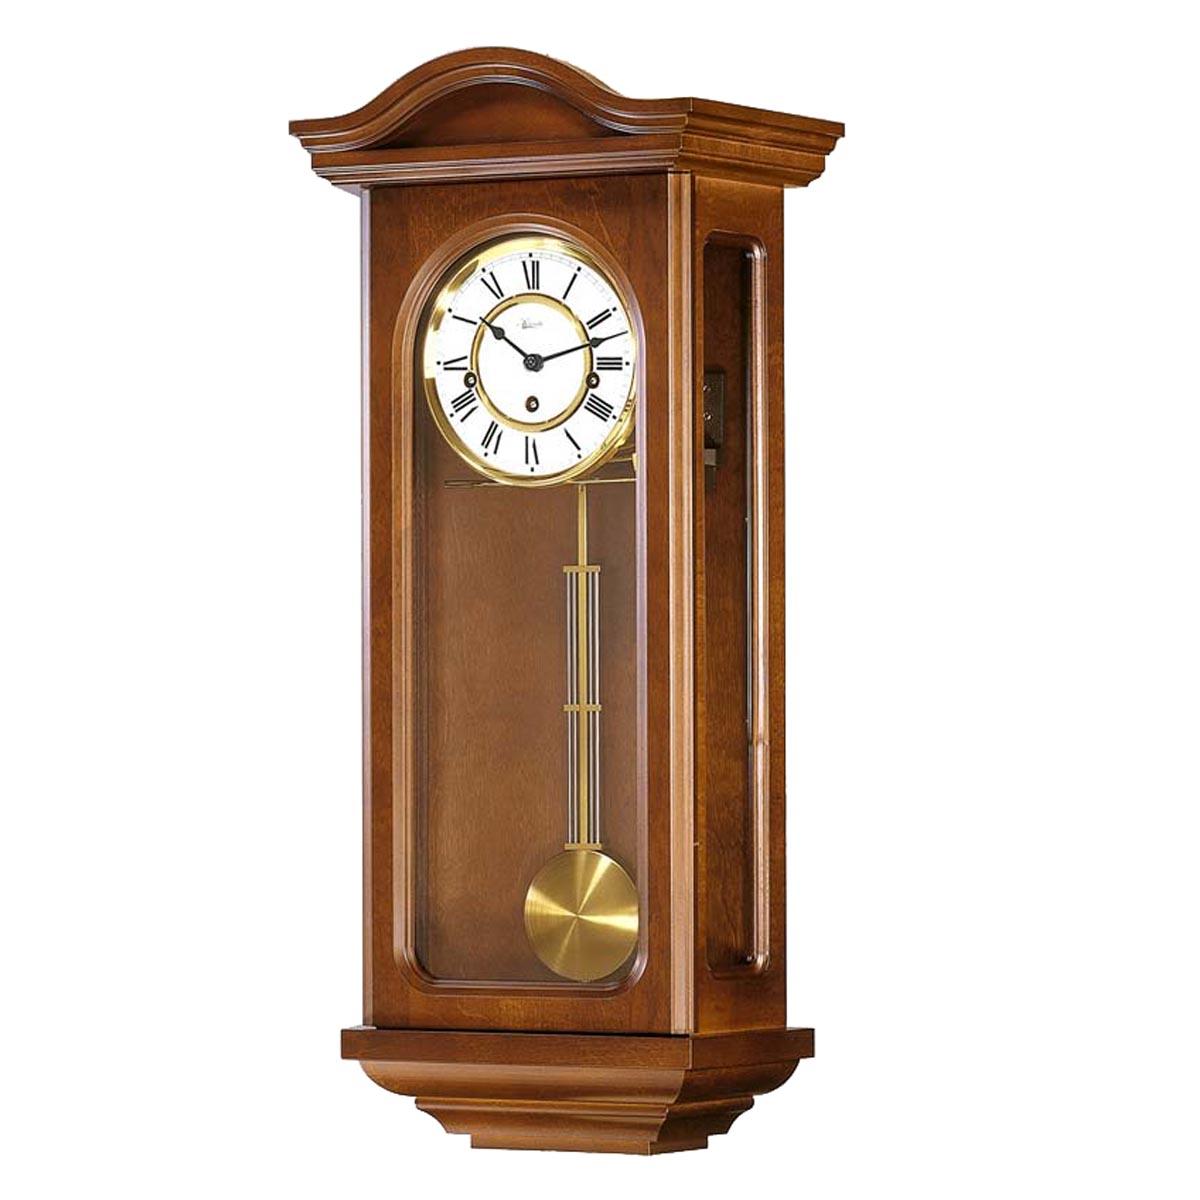 Hermle RILSTON-70290-030341 Regulator Wall Clock